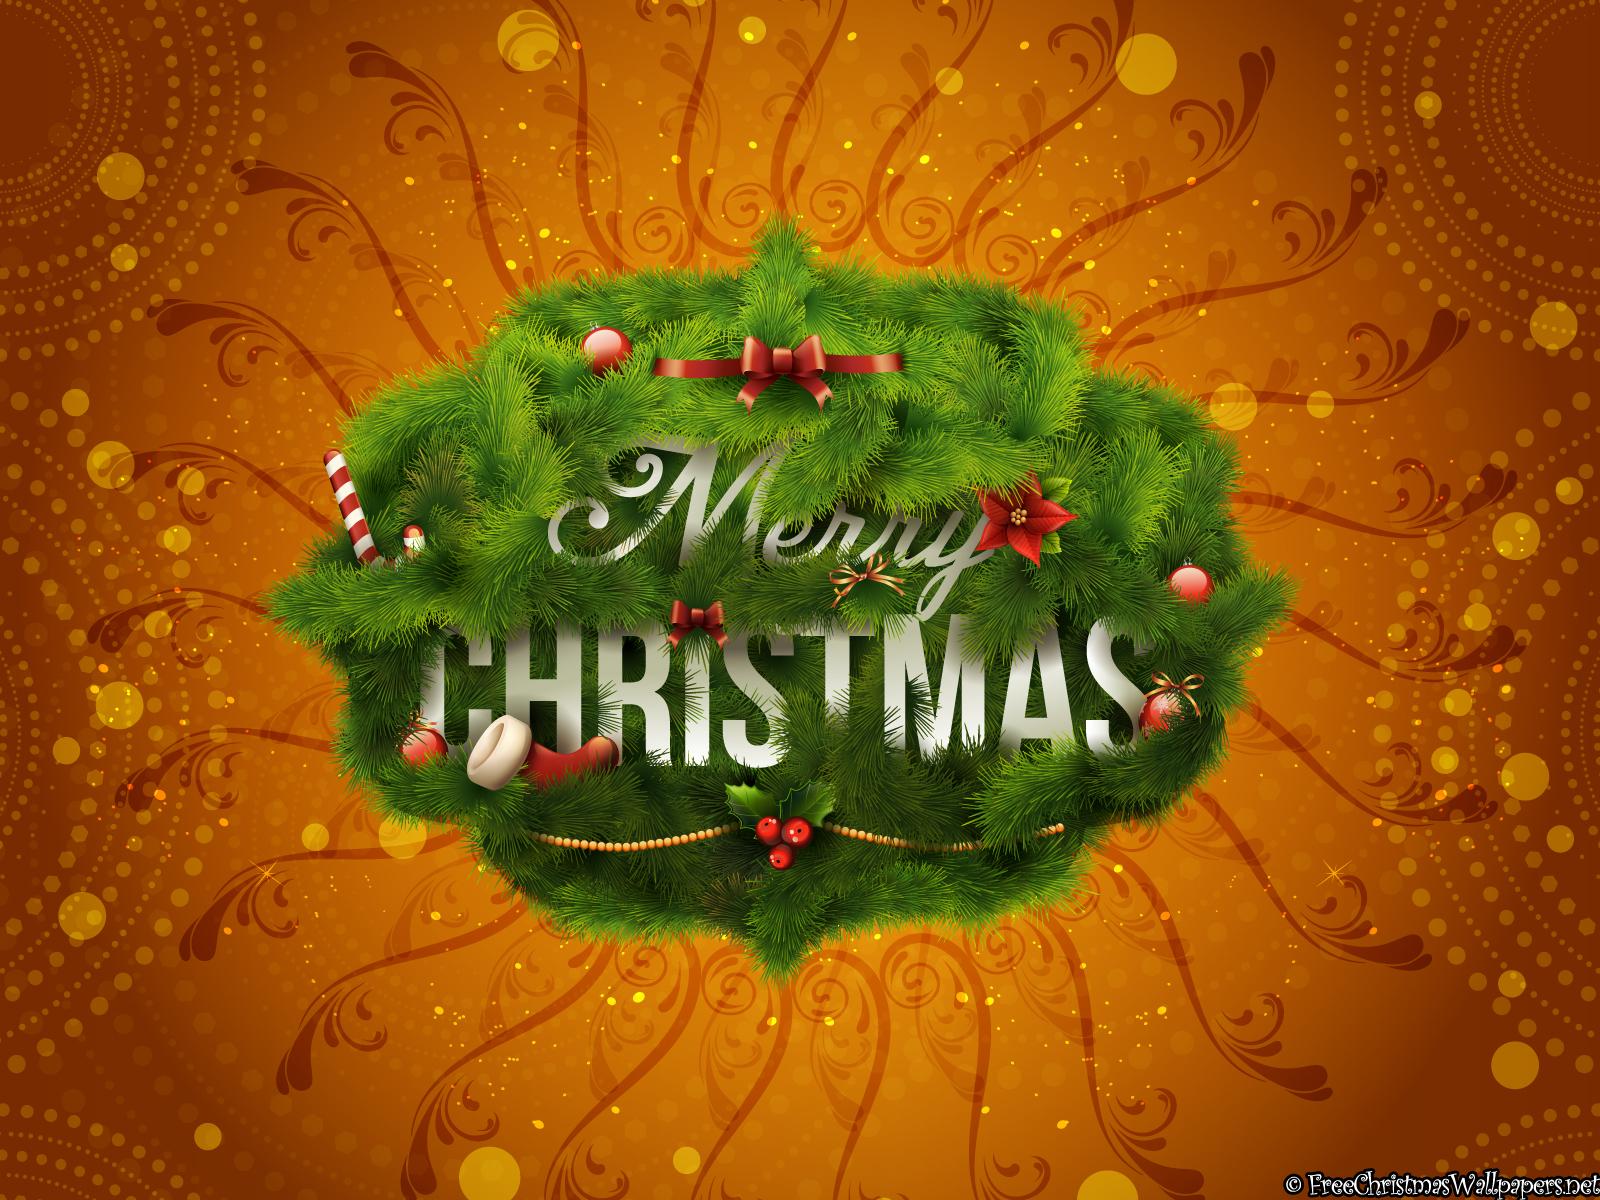 http://3.bp.blogspot.com/-QLcZuSZT7LA/UNiHIArv_9I/AAAAAAAAJSg/BzriyW9iPZY/s1600/Merry+Cristmas+greeting+(1).jpeg